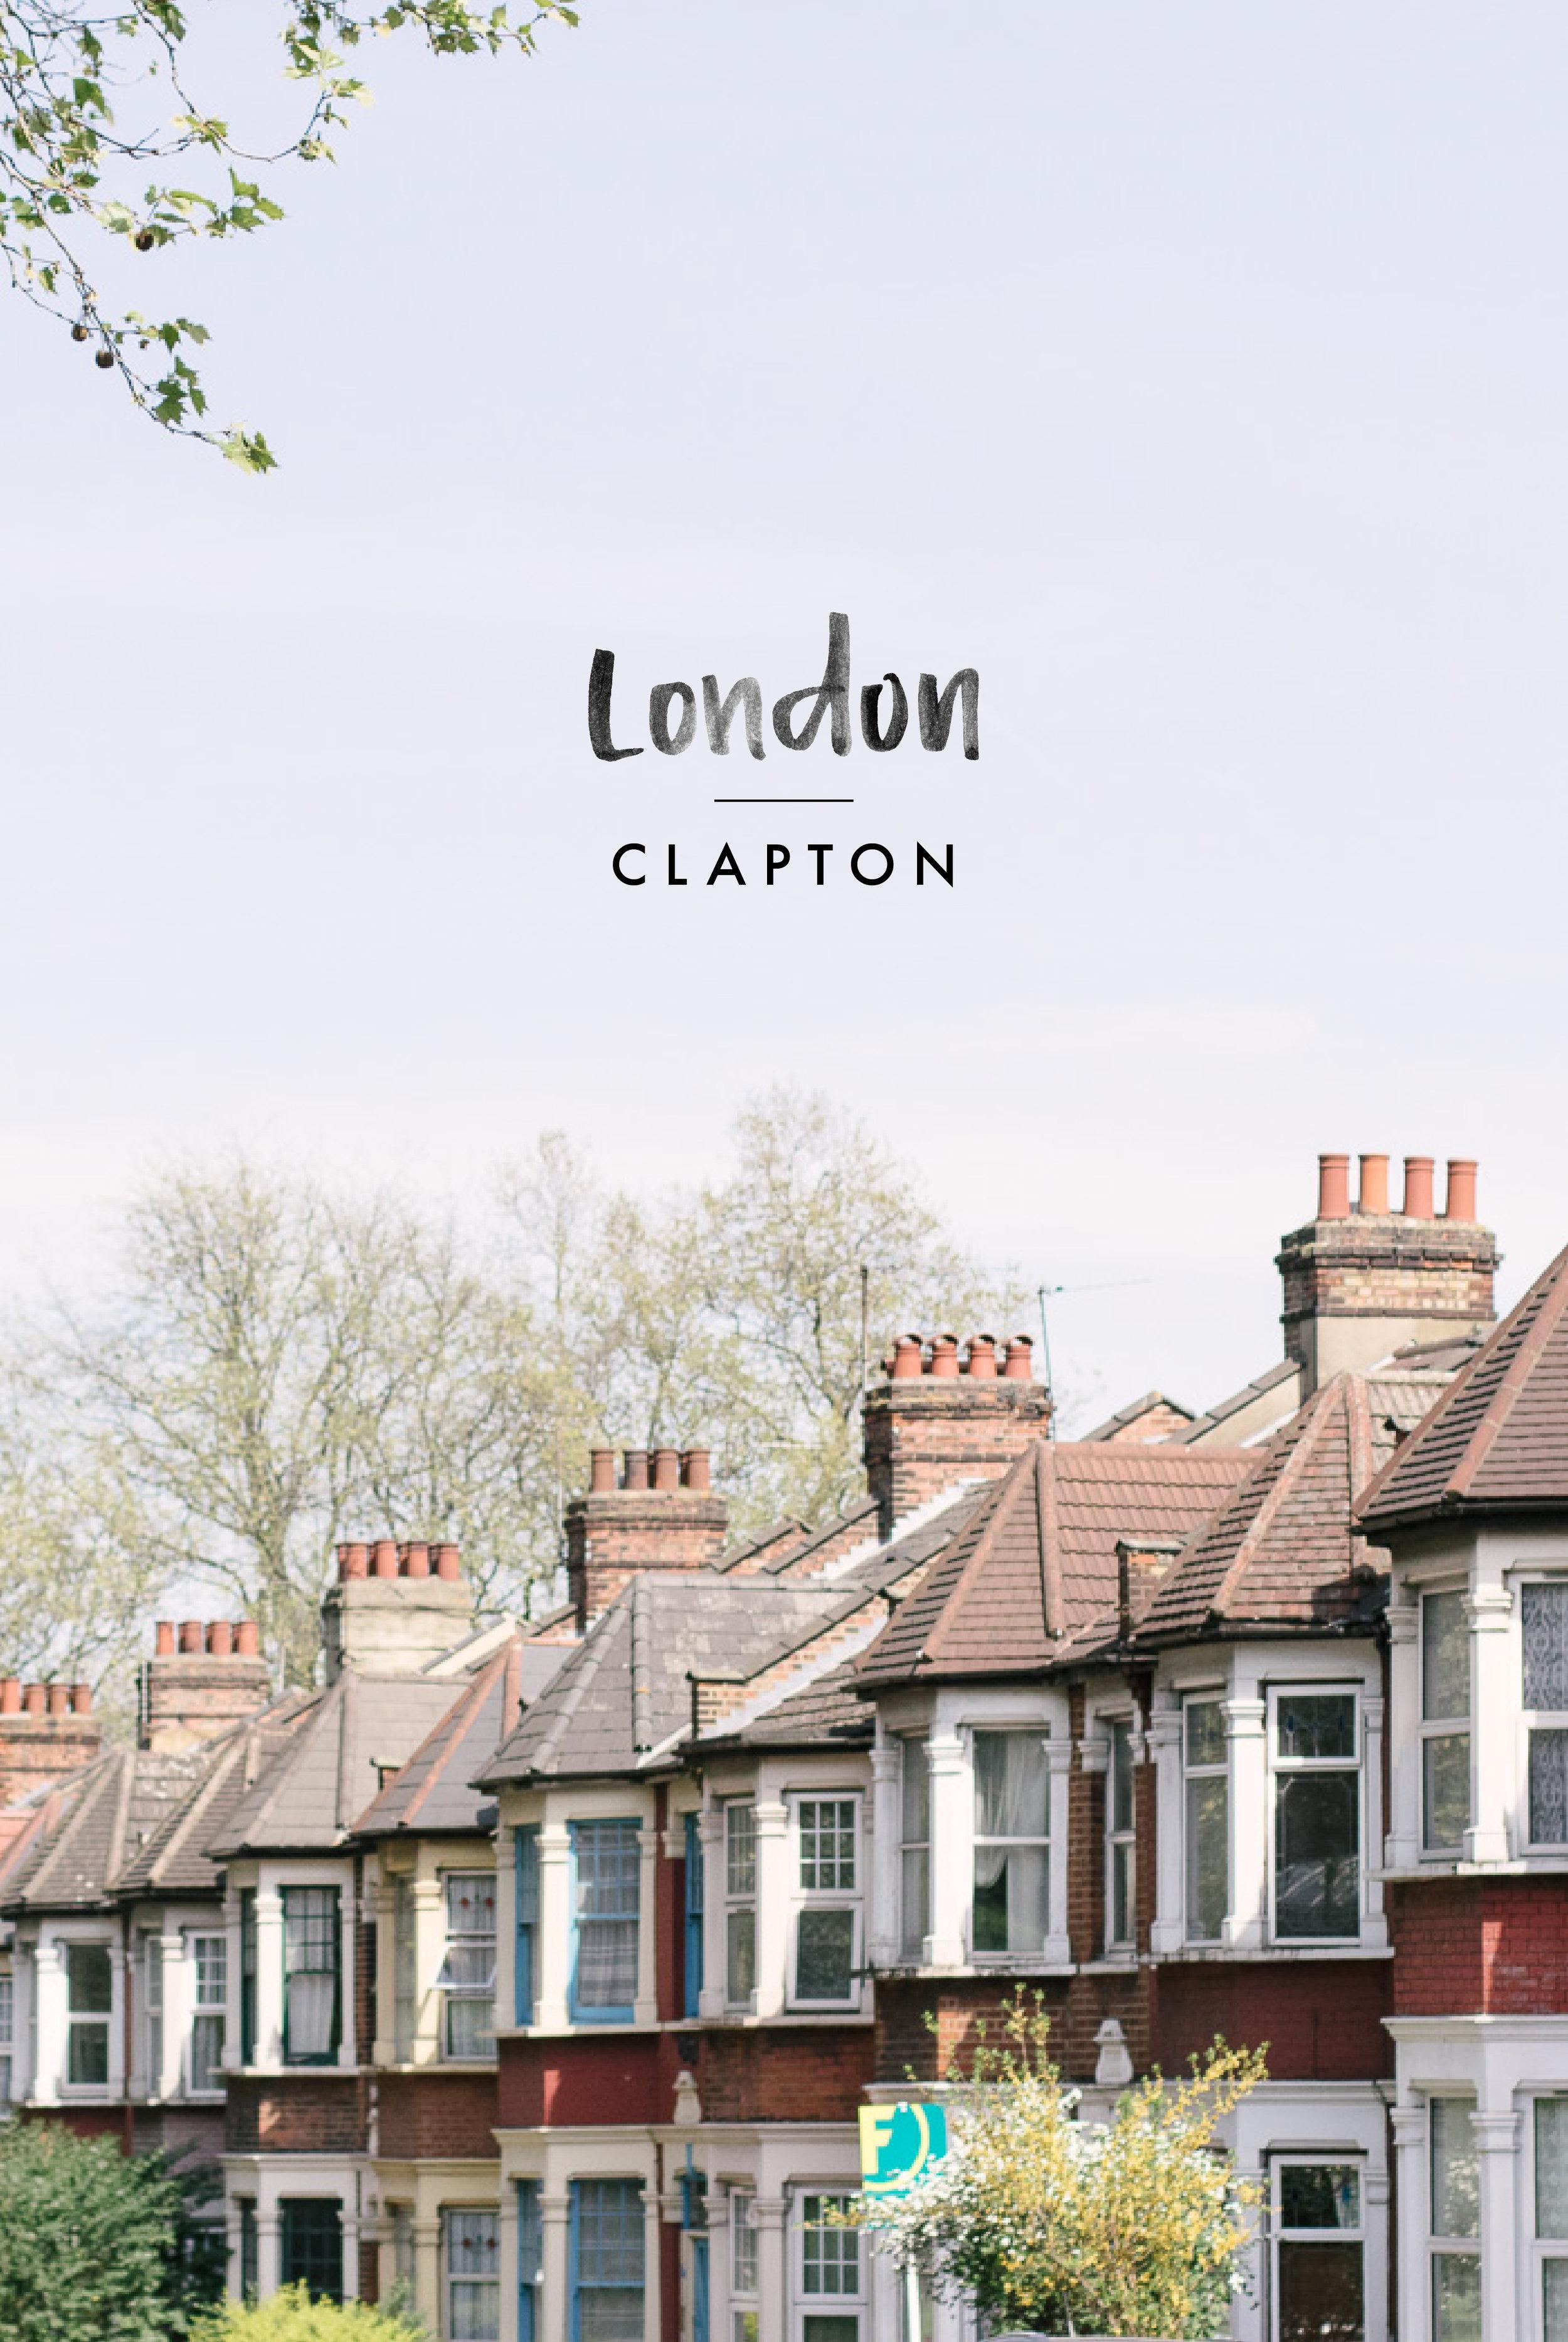 london-clapton-01.jpg